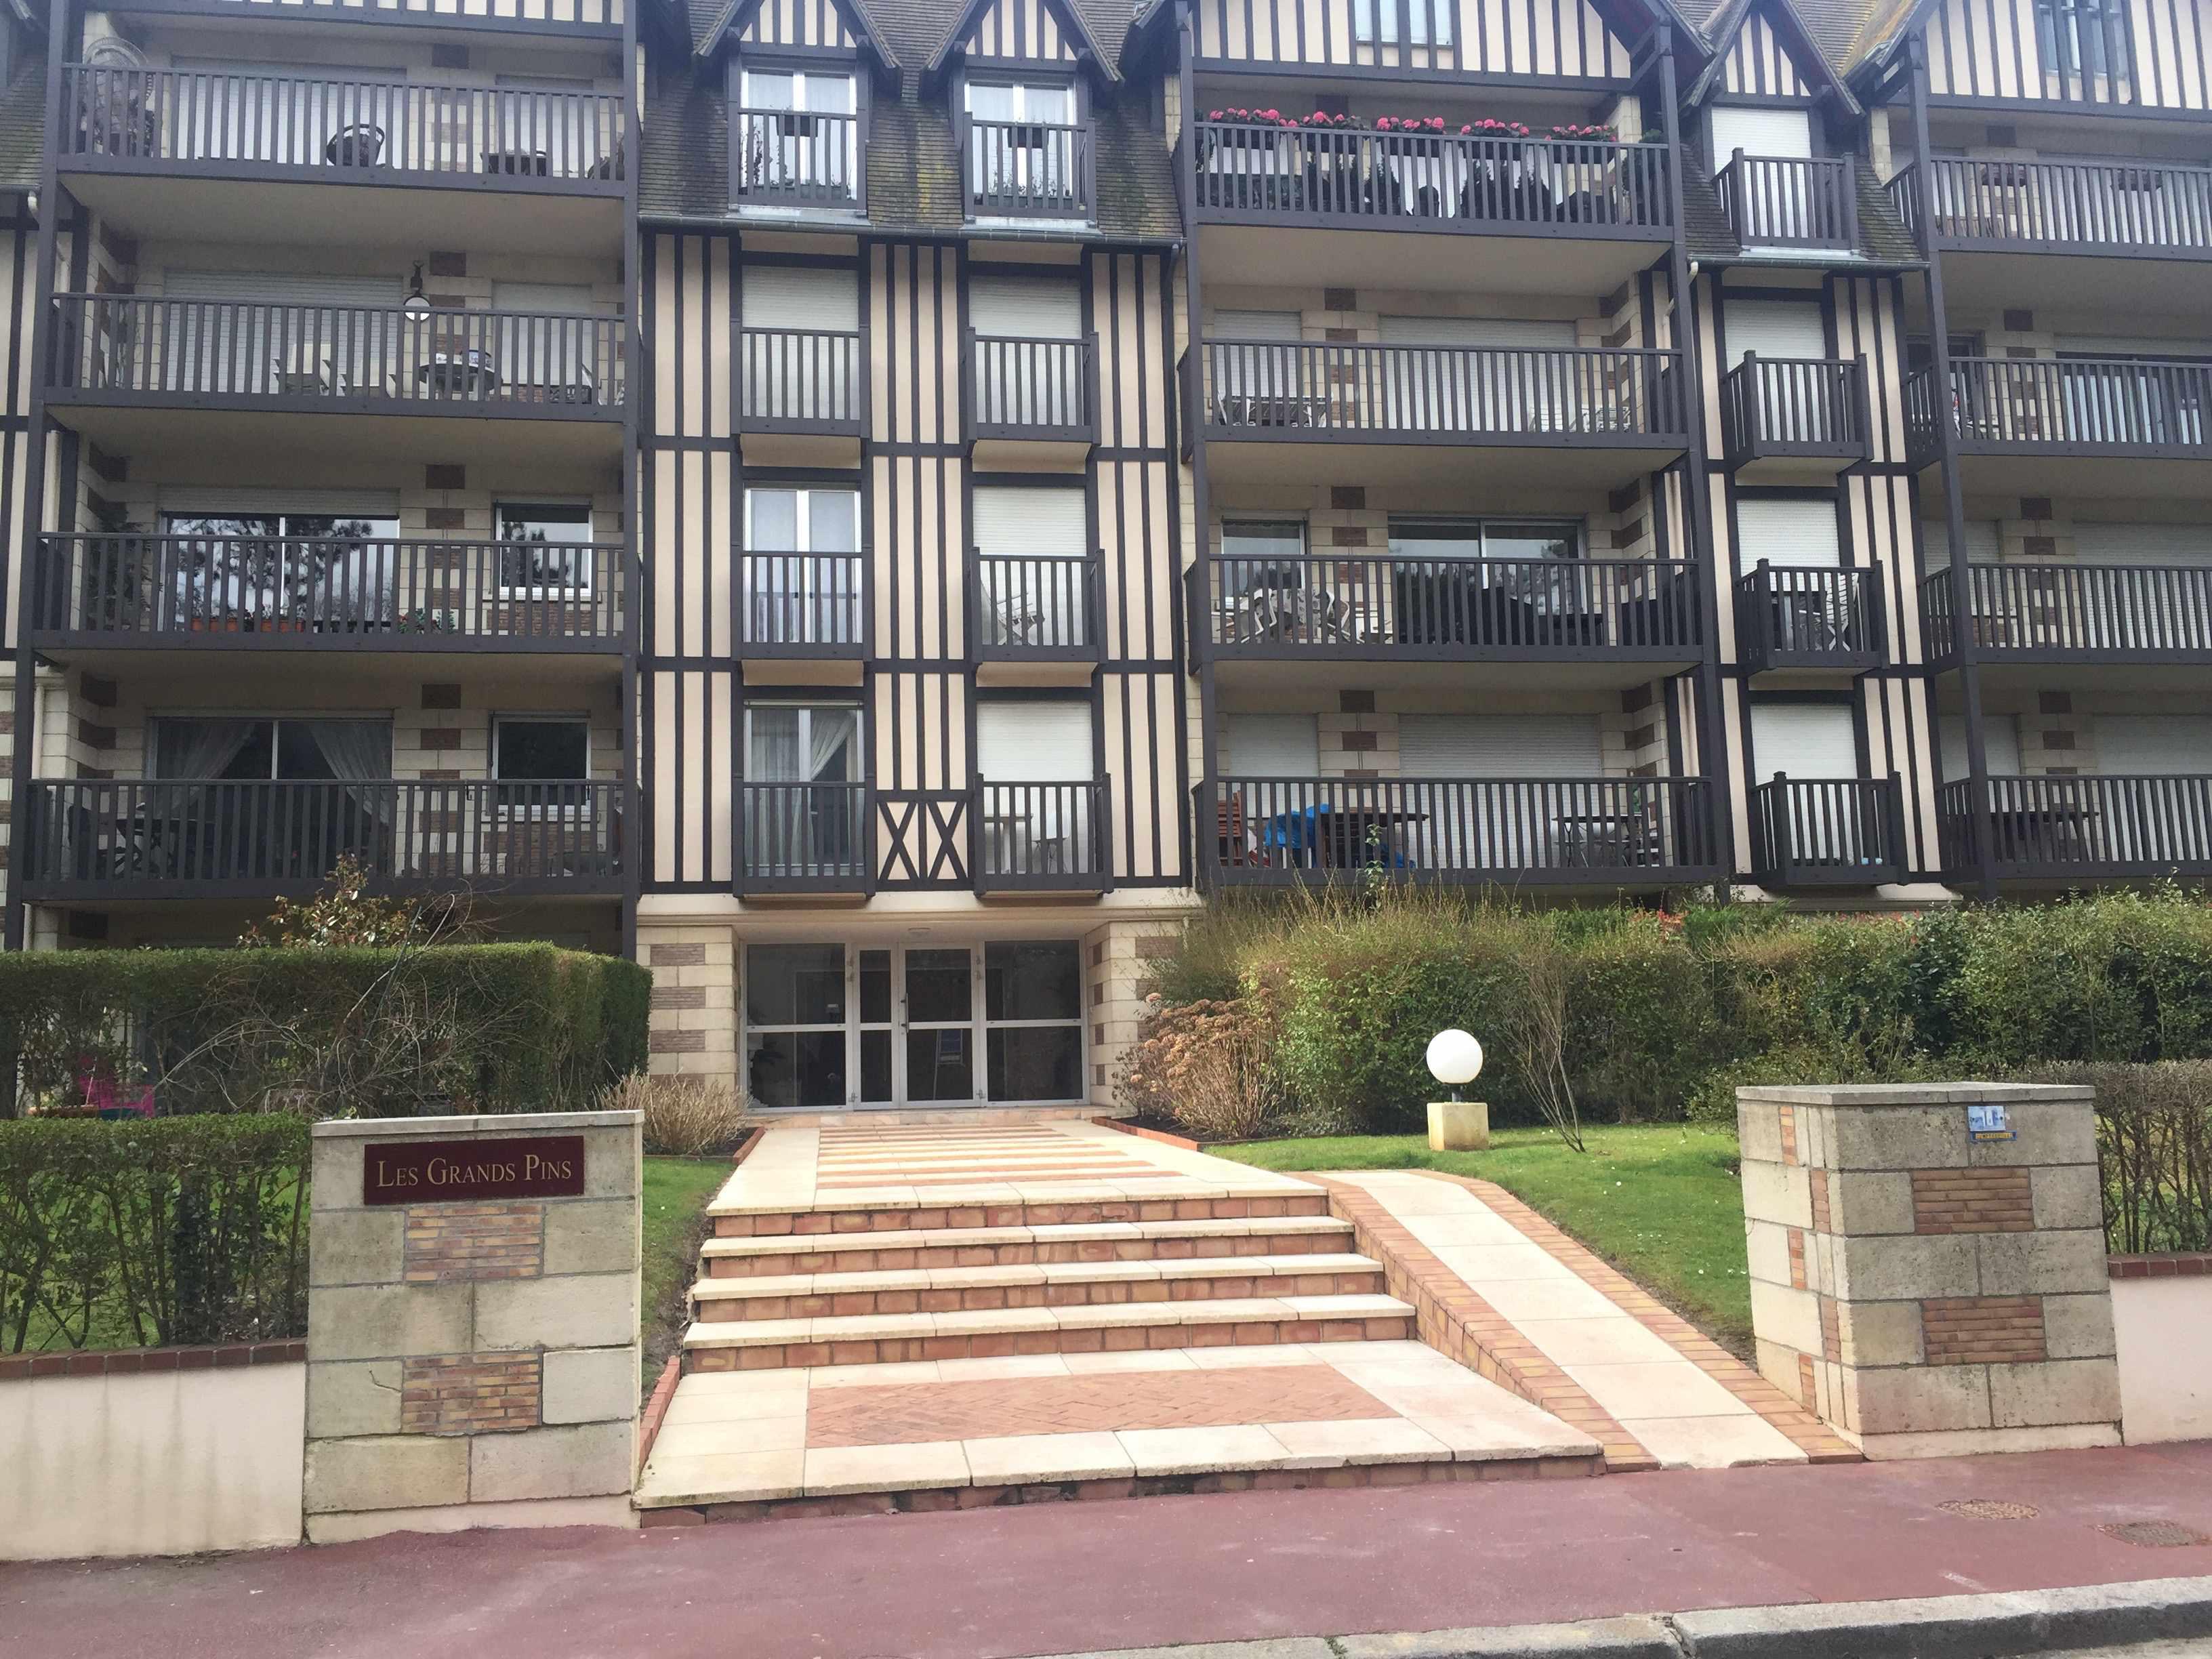 Vente appartement vue Mer Deauville